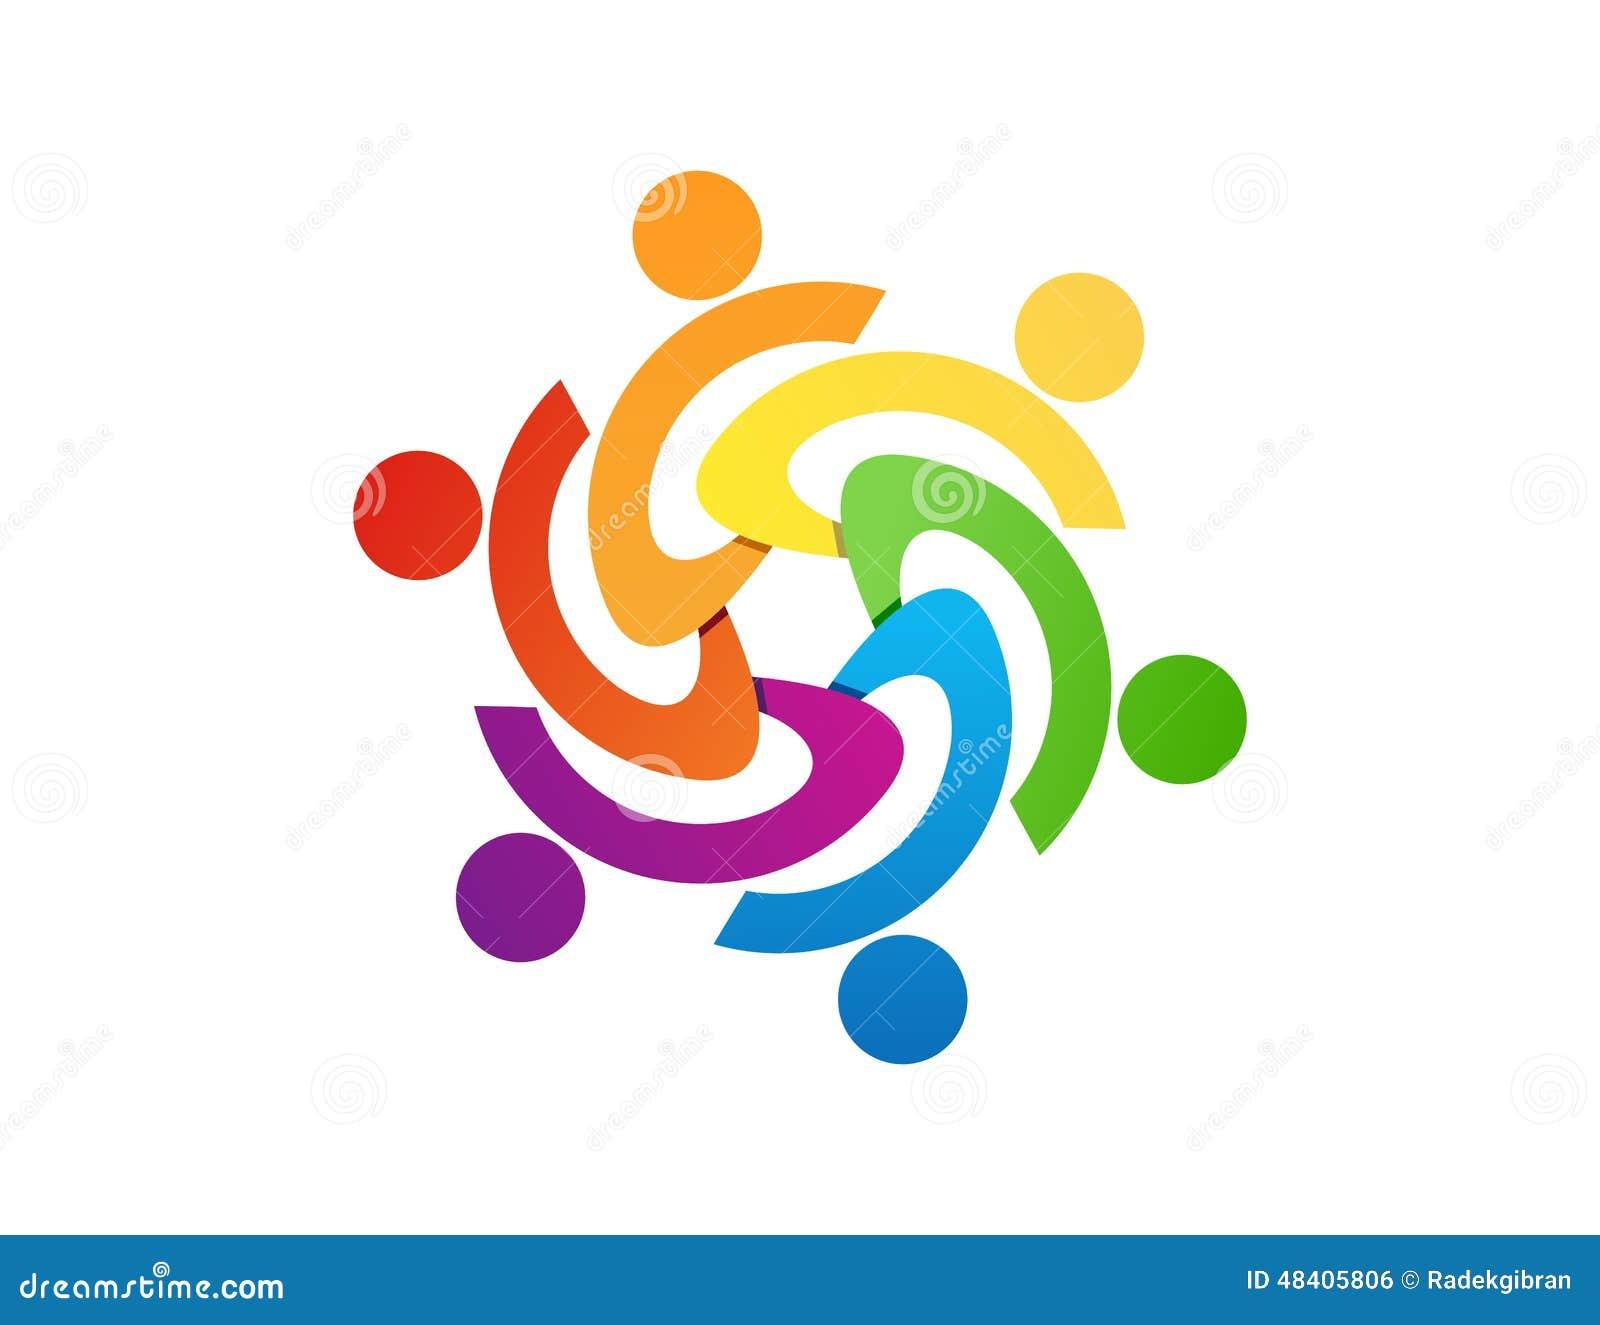 Solidarity Logos Designs